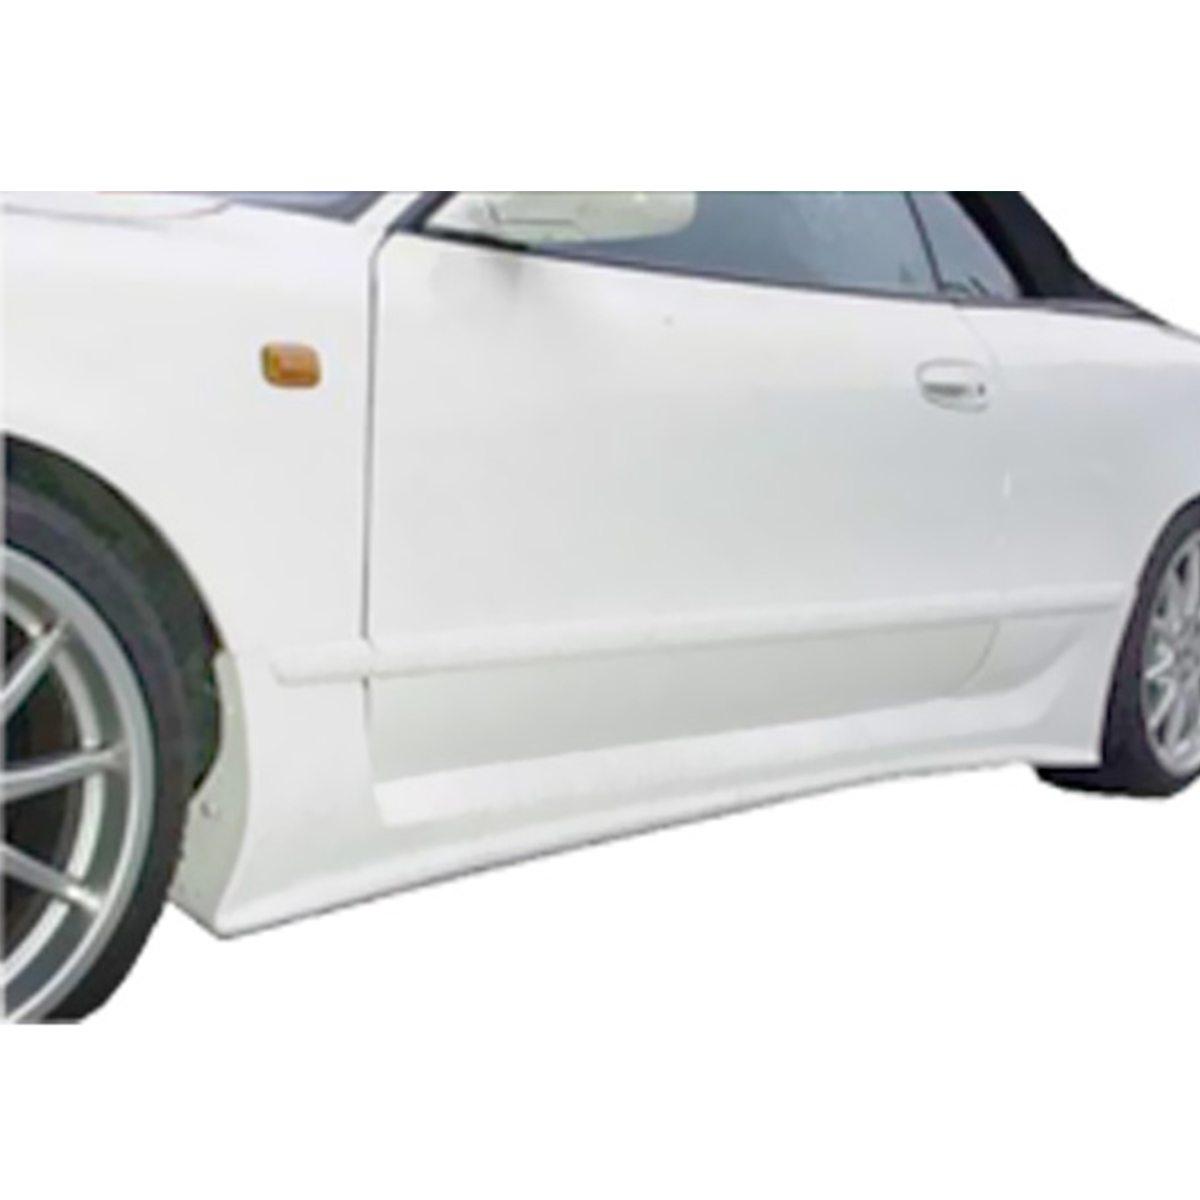 Toyota-Celica-90-T18-Emb